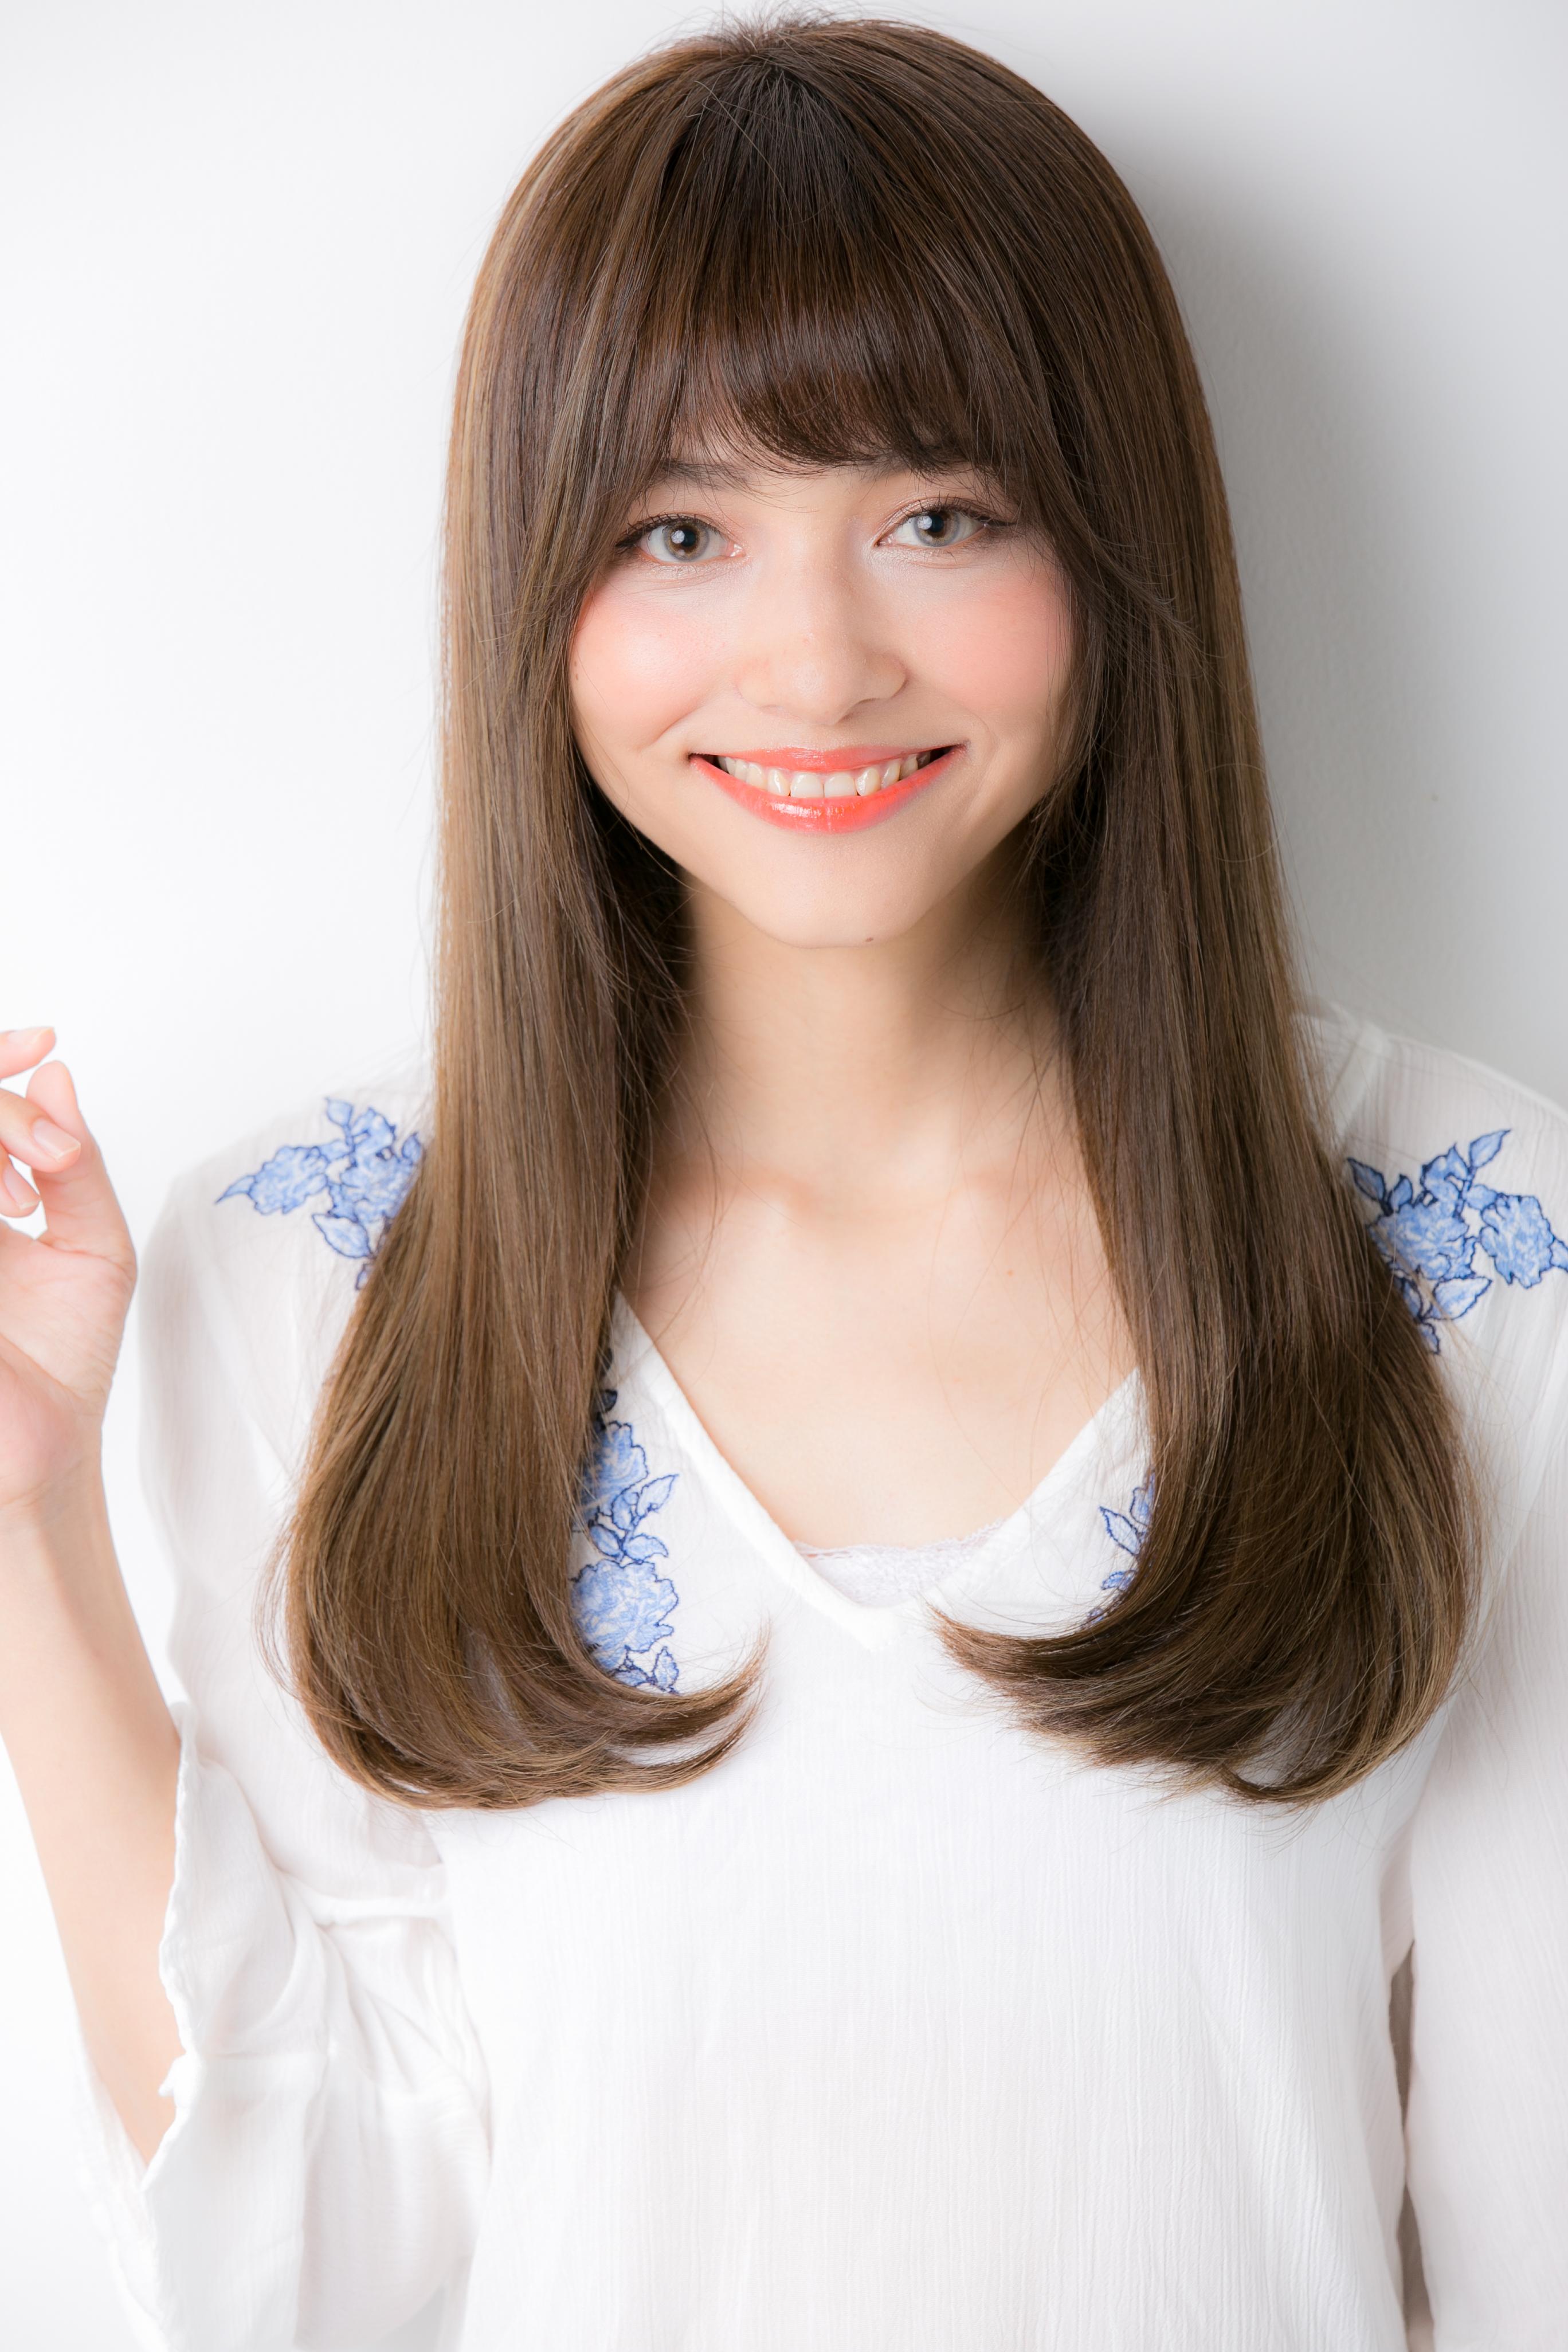 【Euphoria銀座本店/斎藤】髪質改善☆大人ツヤ髪